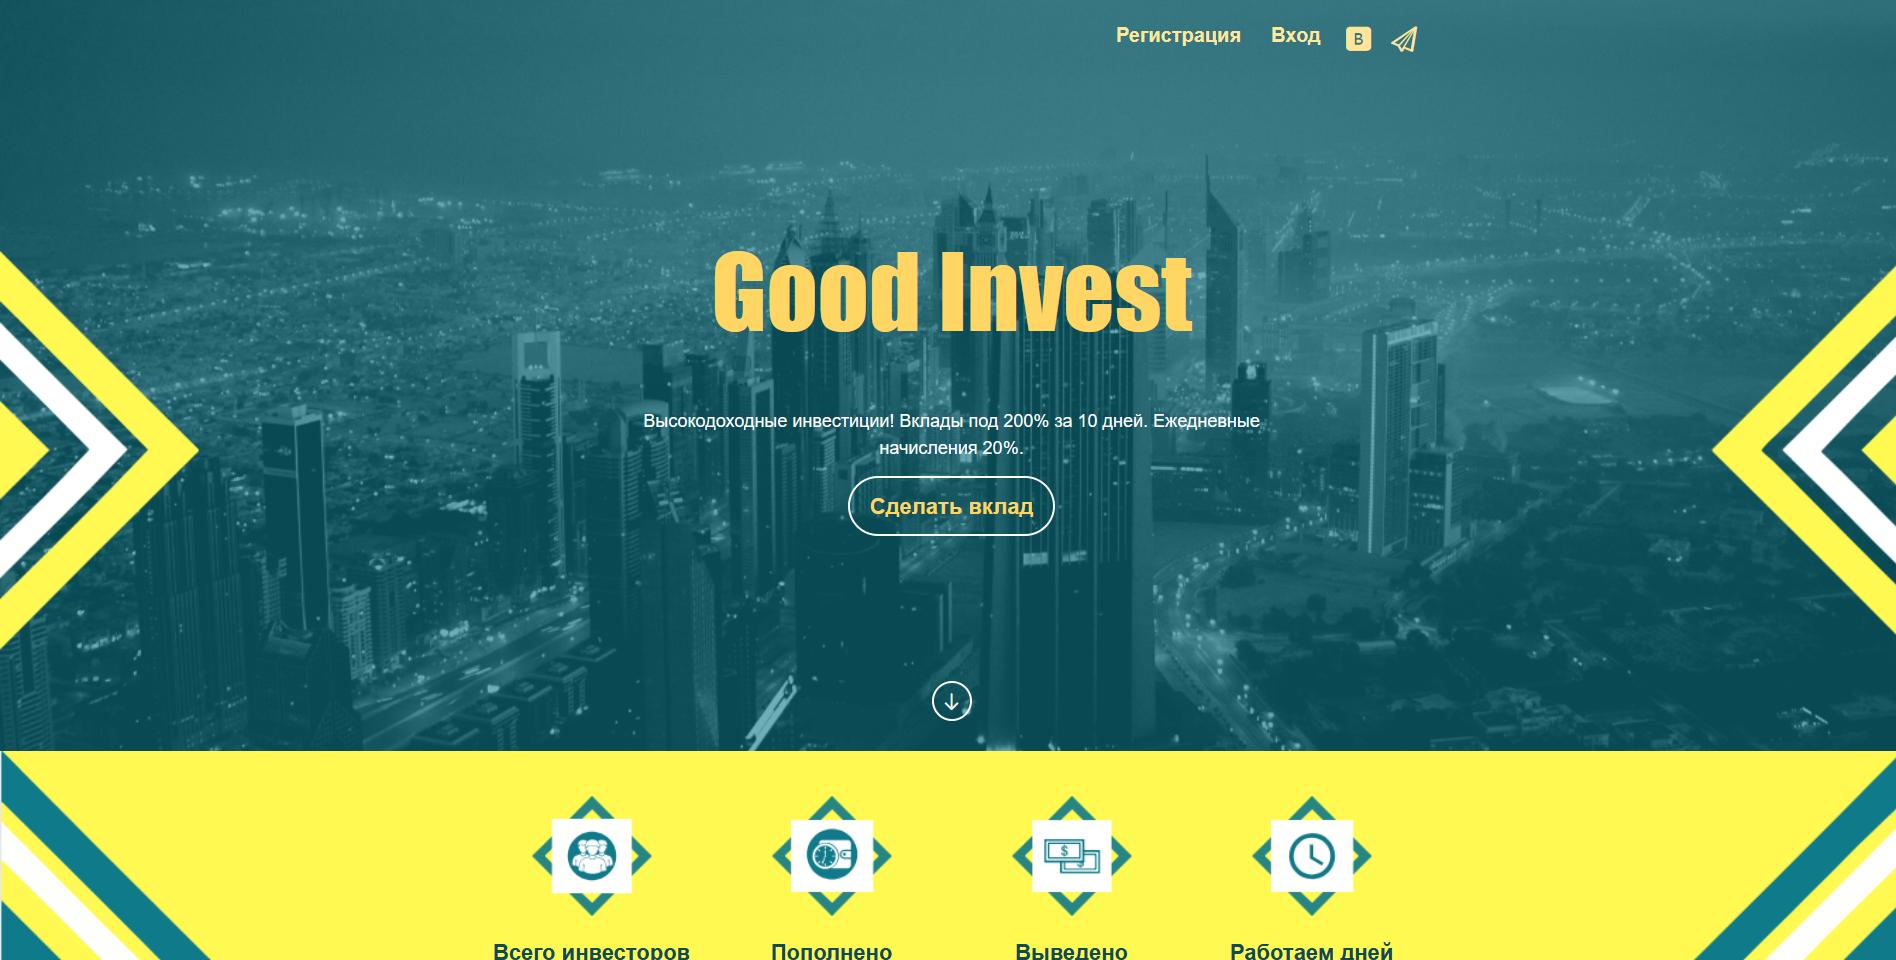 GoodInvest